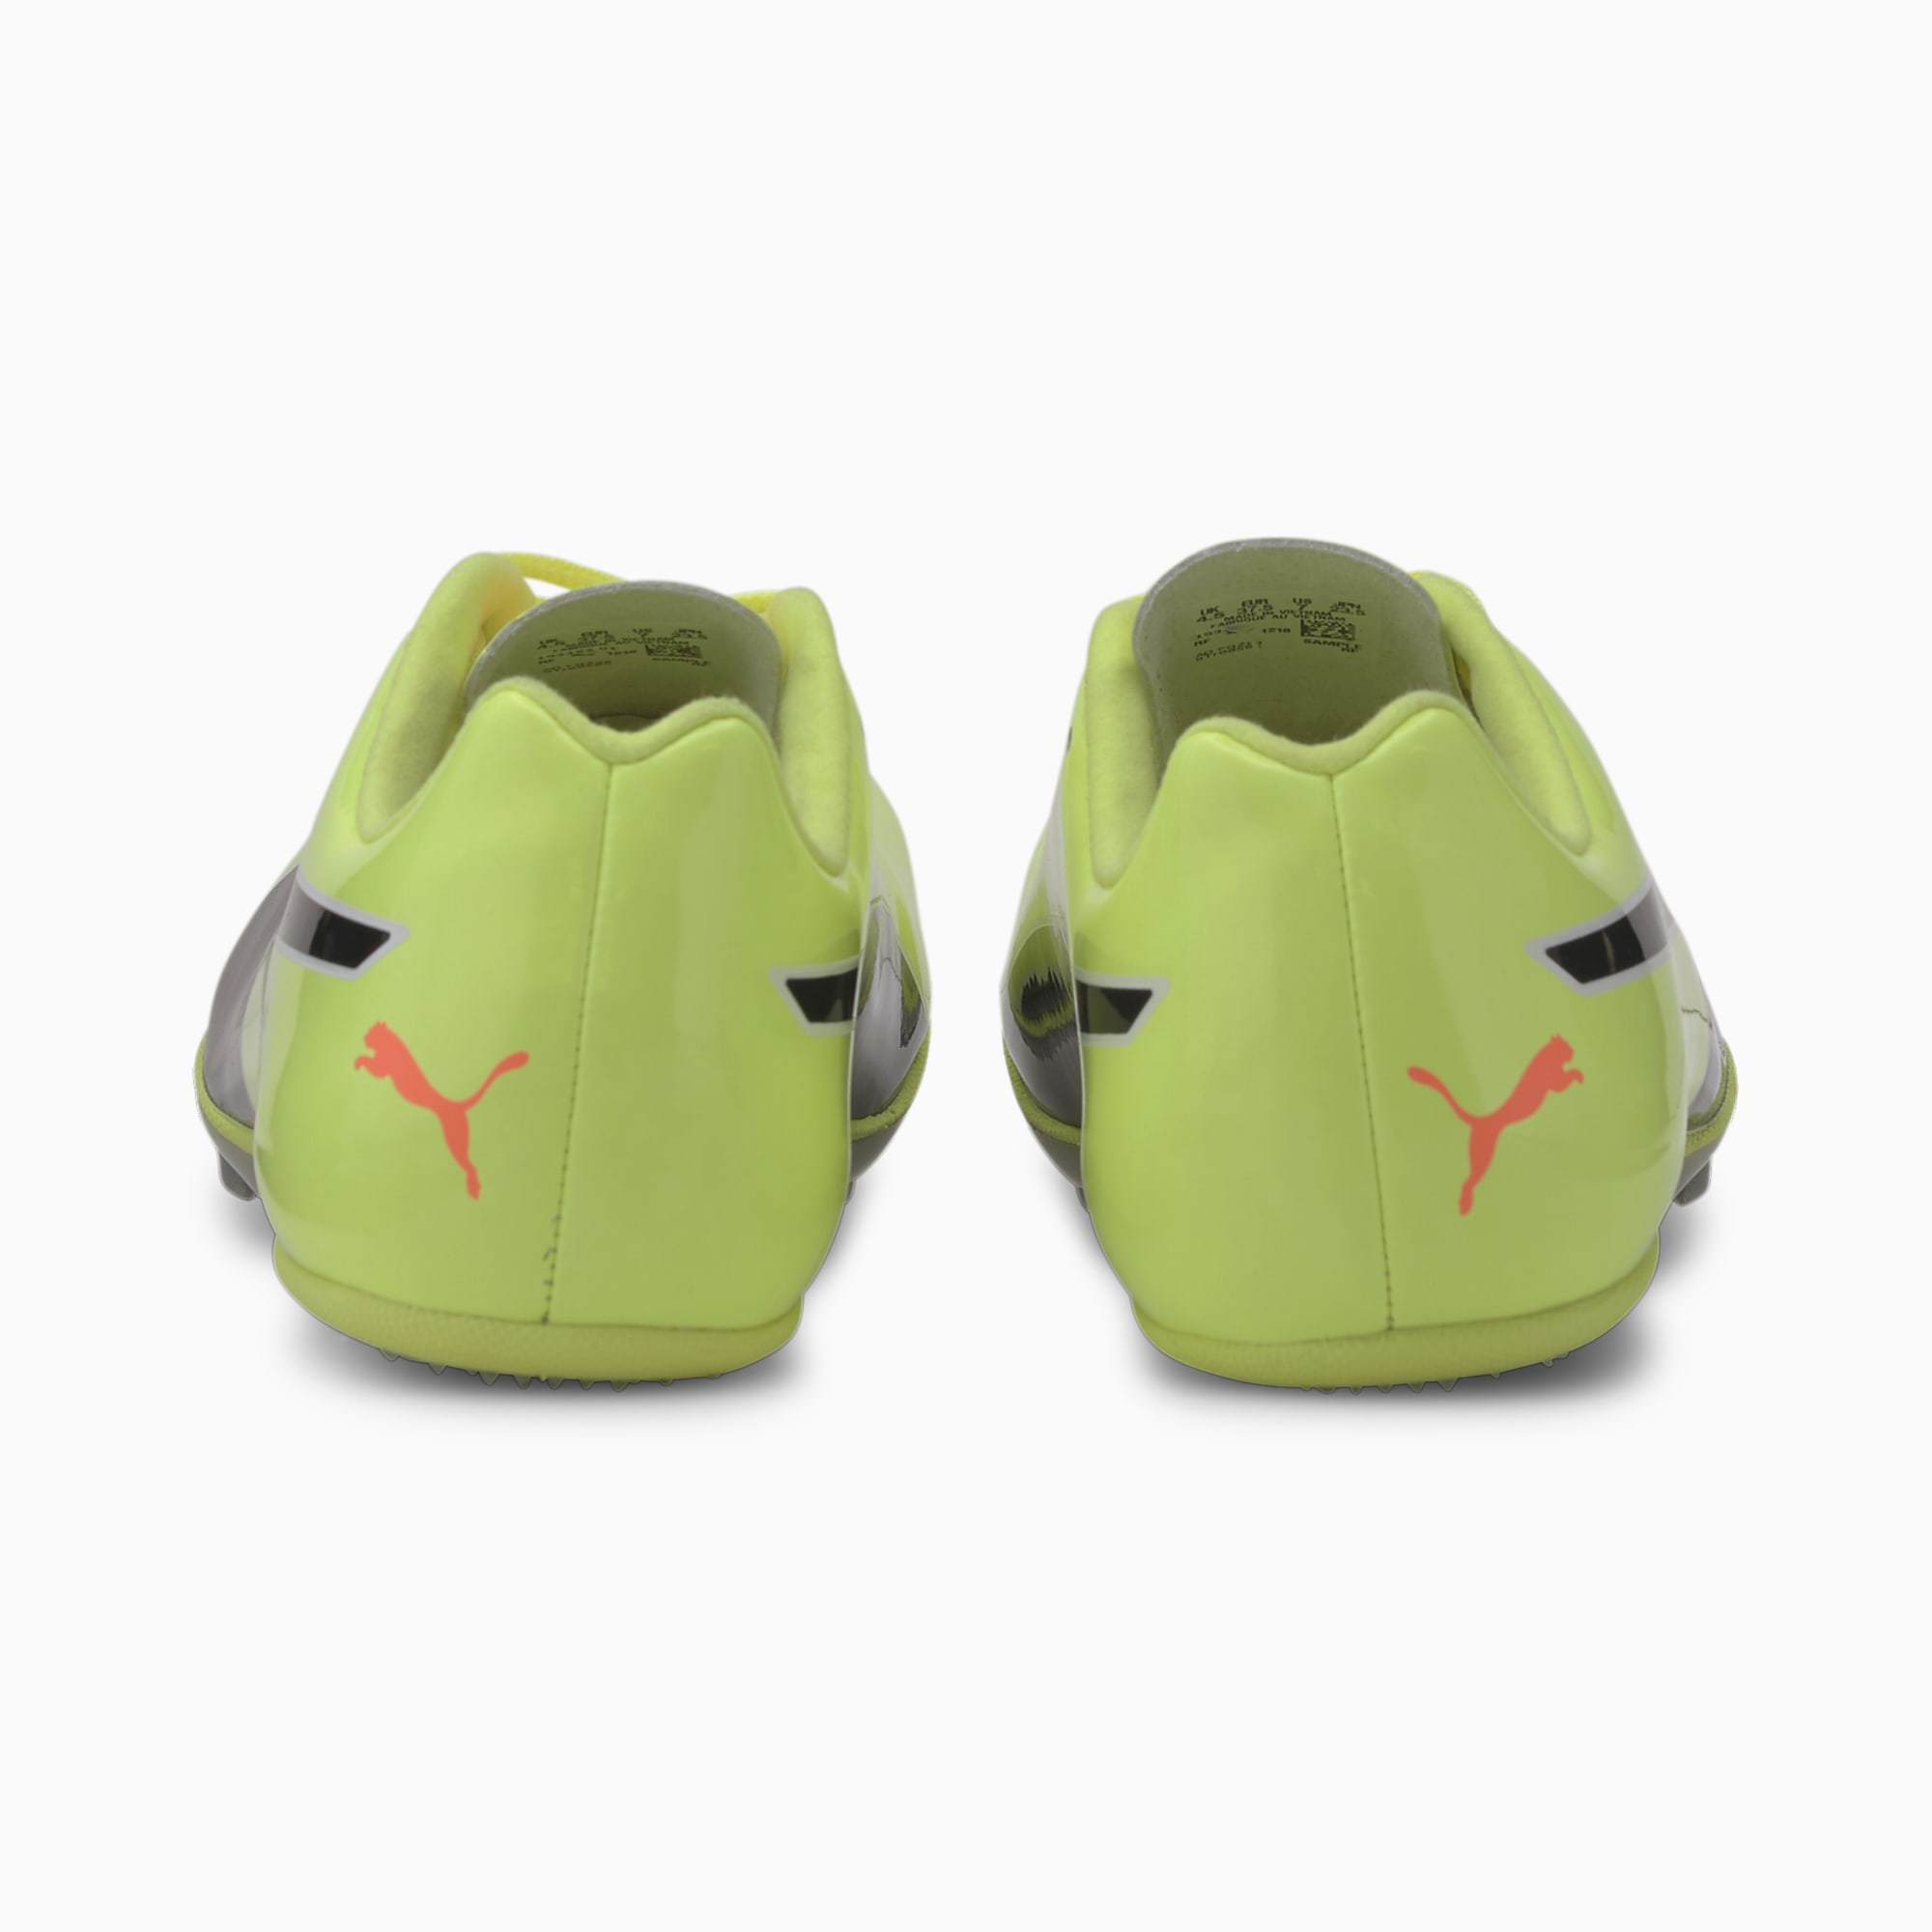 Chaussure d'athlétisme evoSPEED Sprint 10